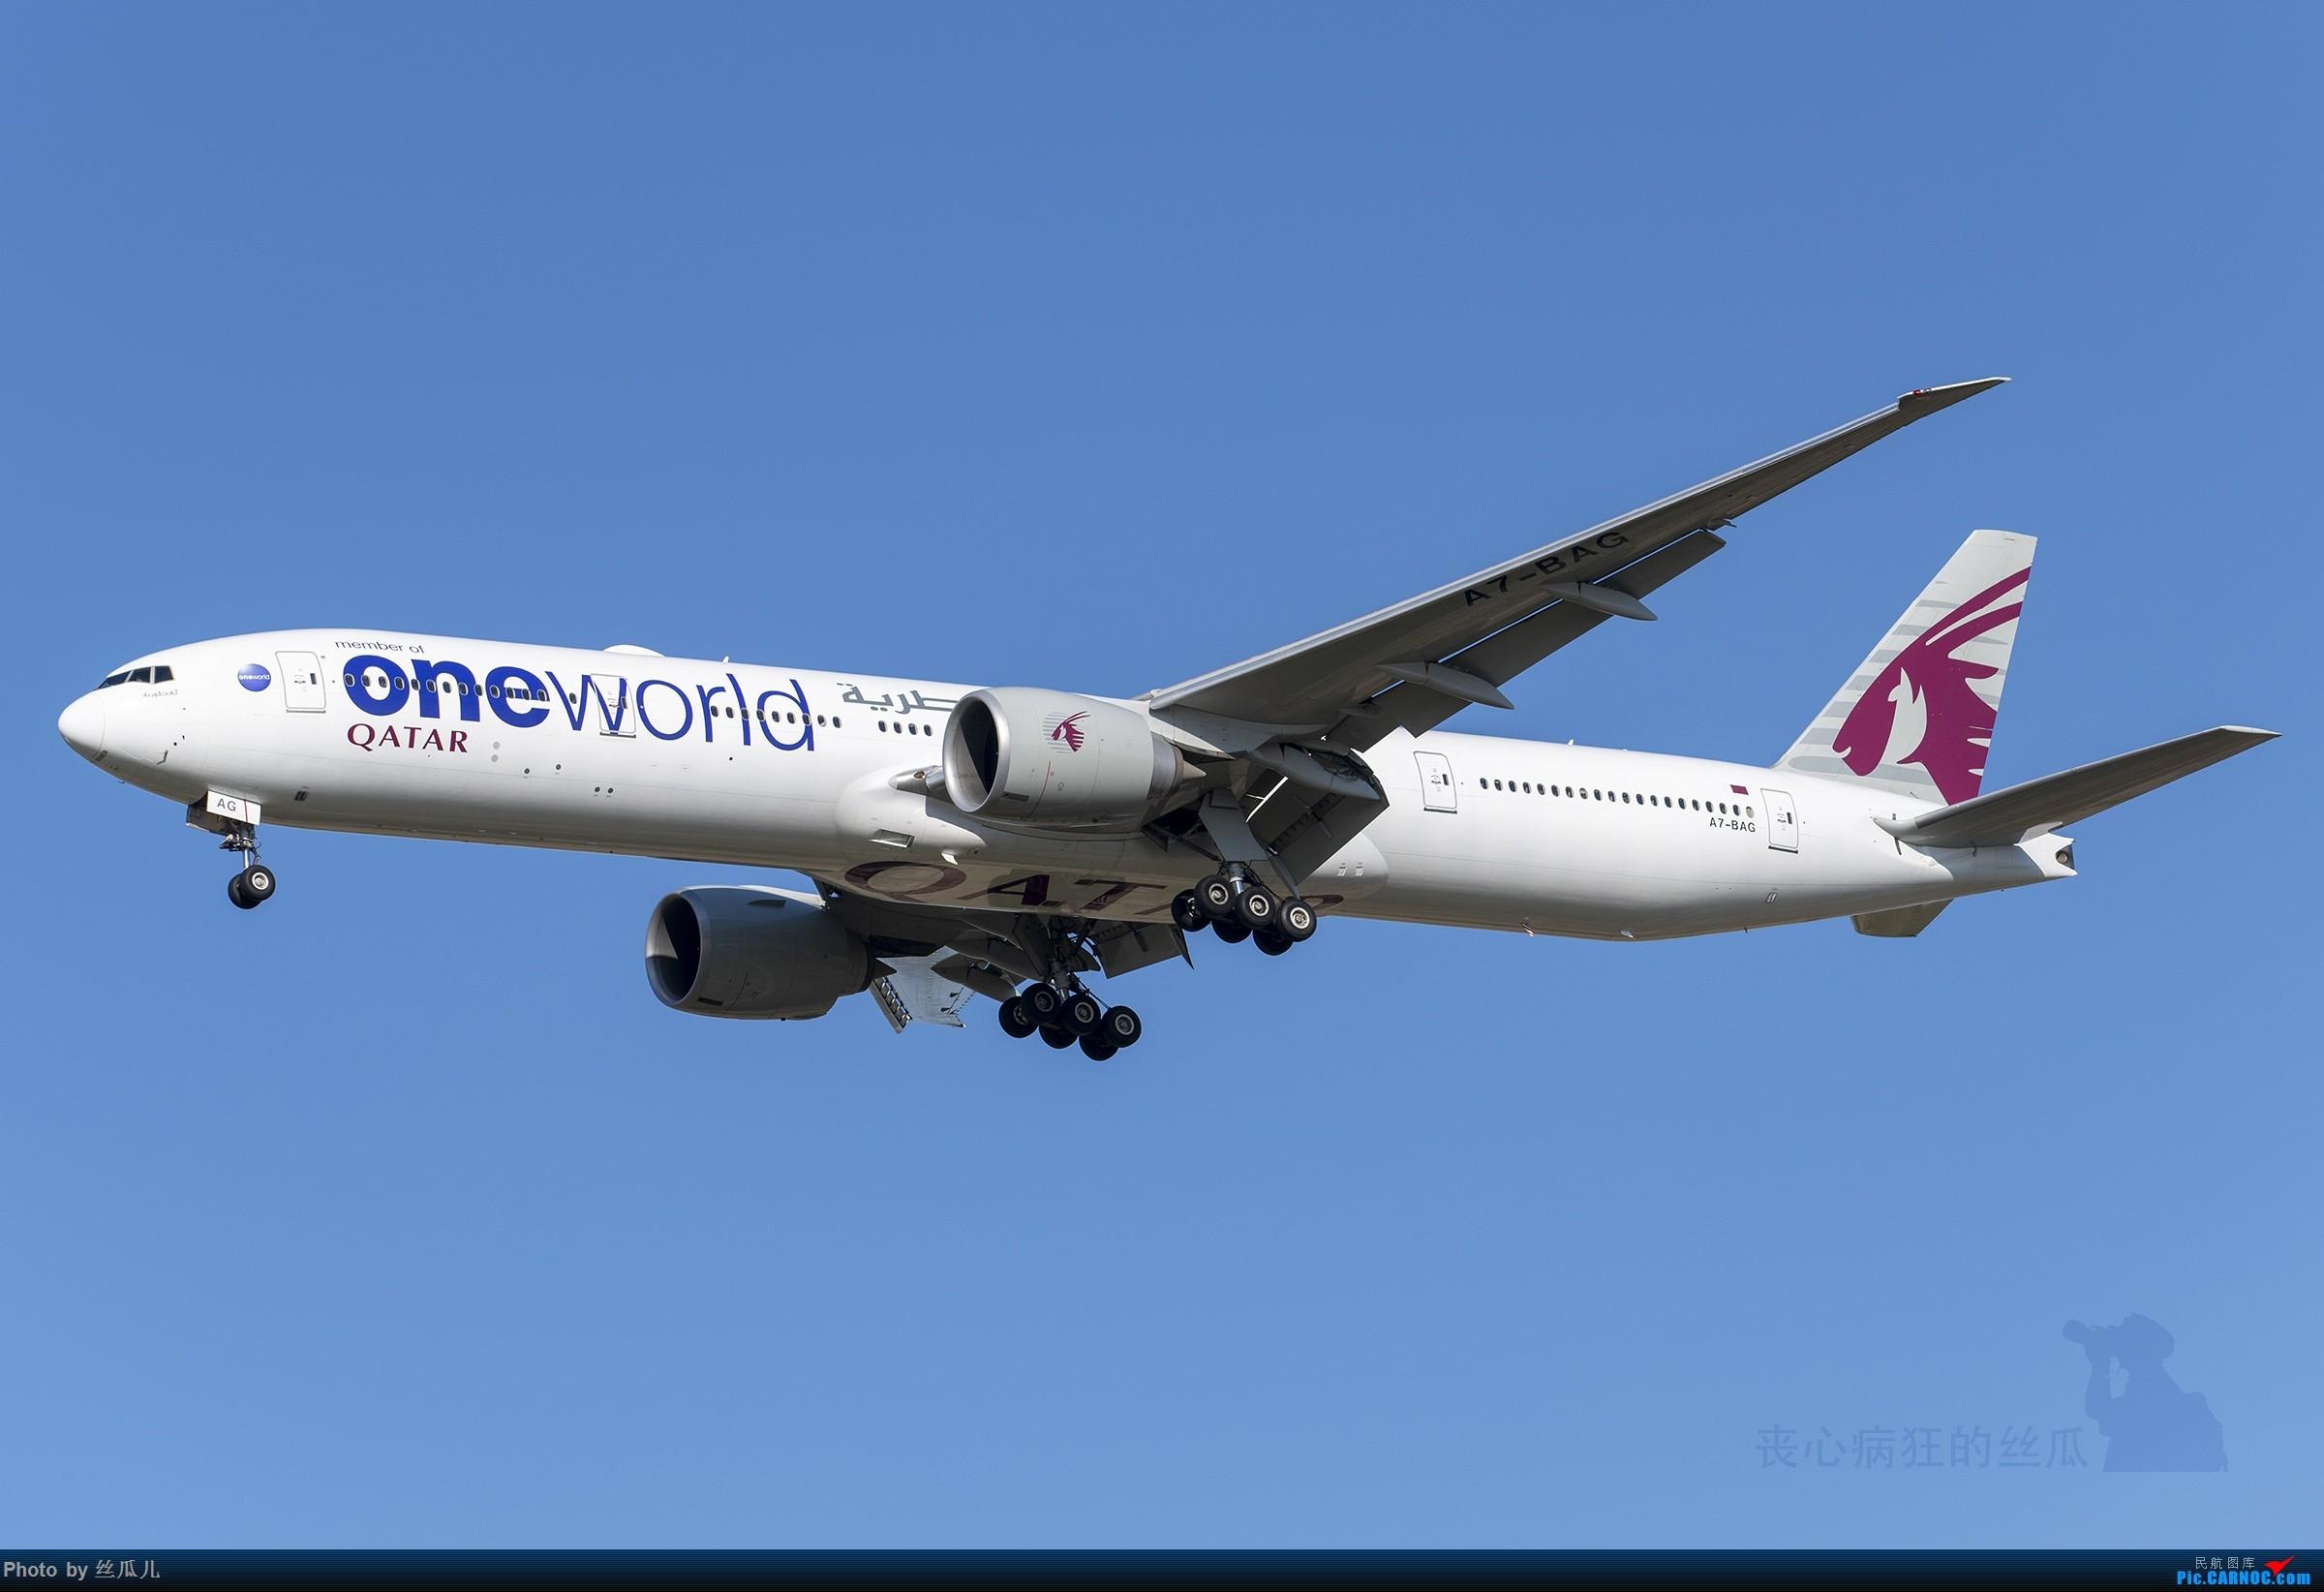 Re:[原创]【丧心病狂的丝瓜】卡航77W----寰宇一家涂装 BOEING 777-300ER A7-BAG 中国上海浦东国际机场